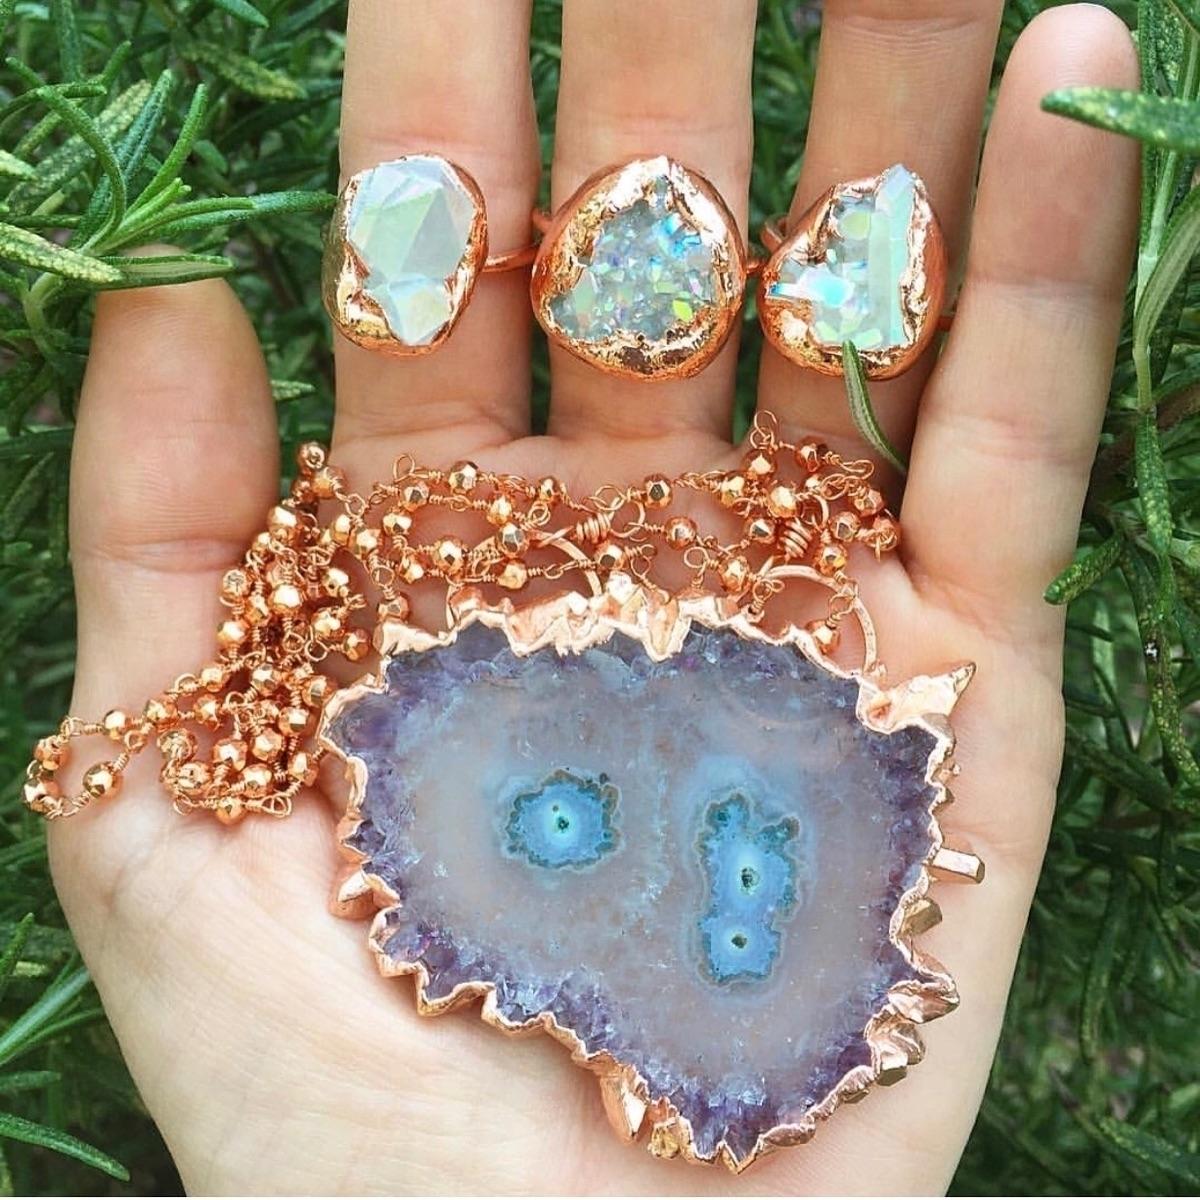 angelaura, stalactite, electroforming - wingostarrjewelry | ello